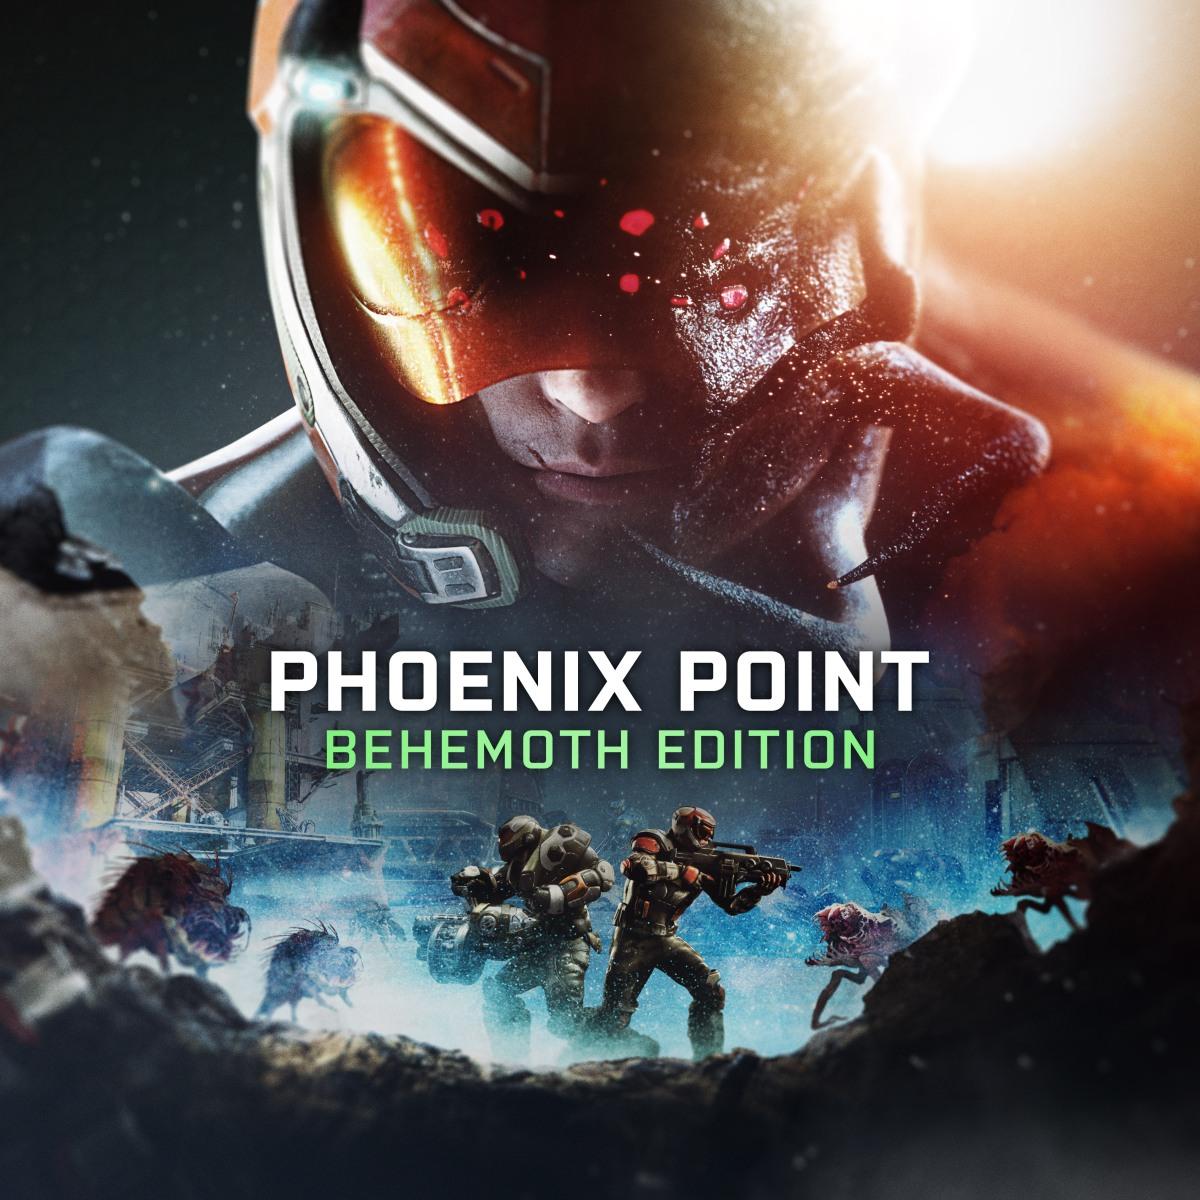 Phoenix Point: Behemoth Edition (PS4Review)